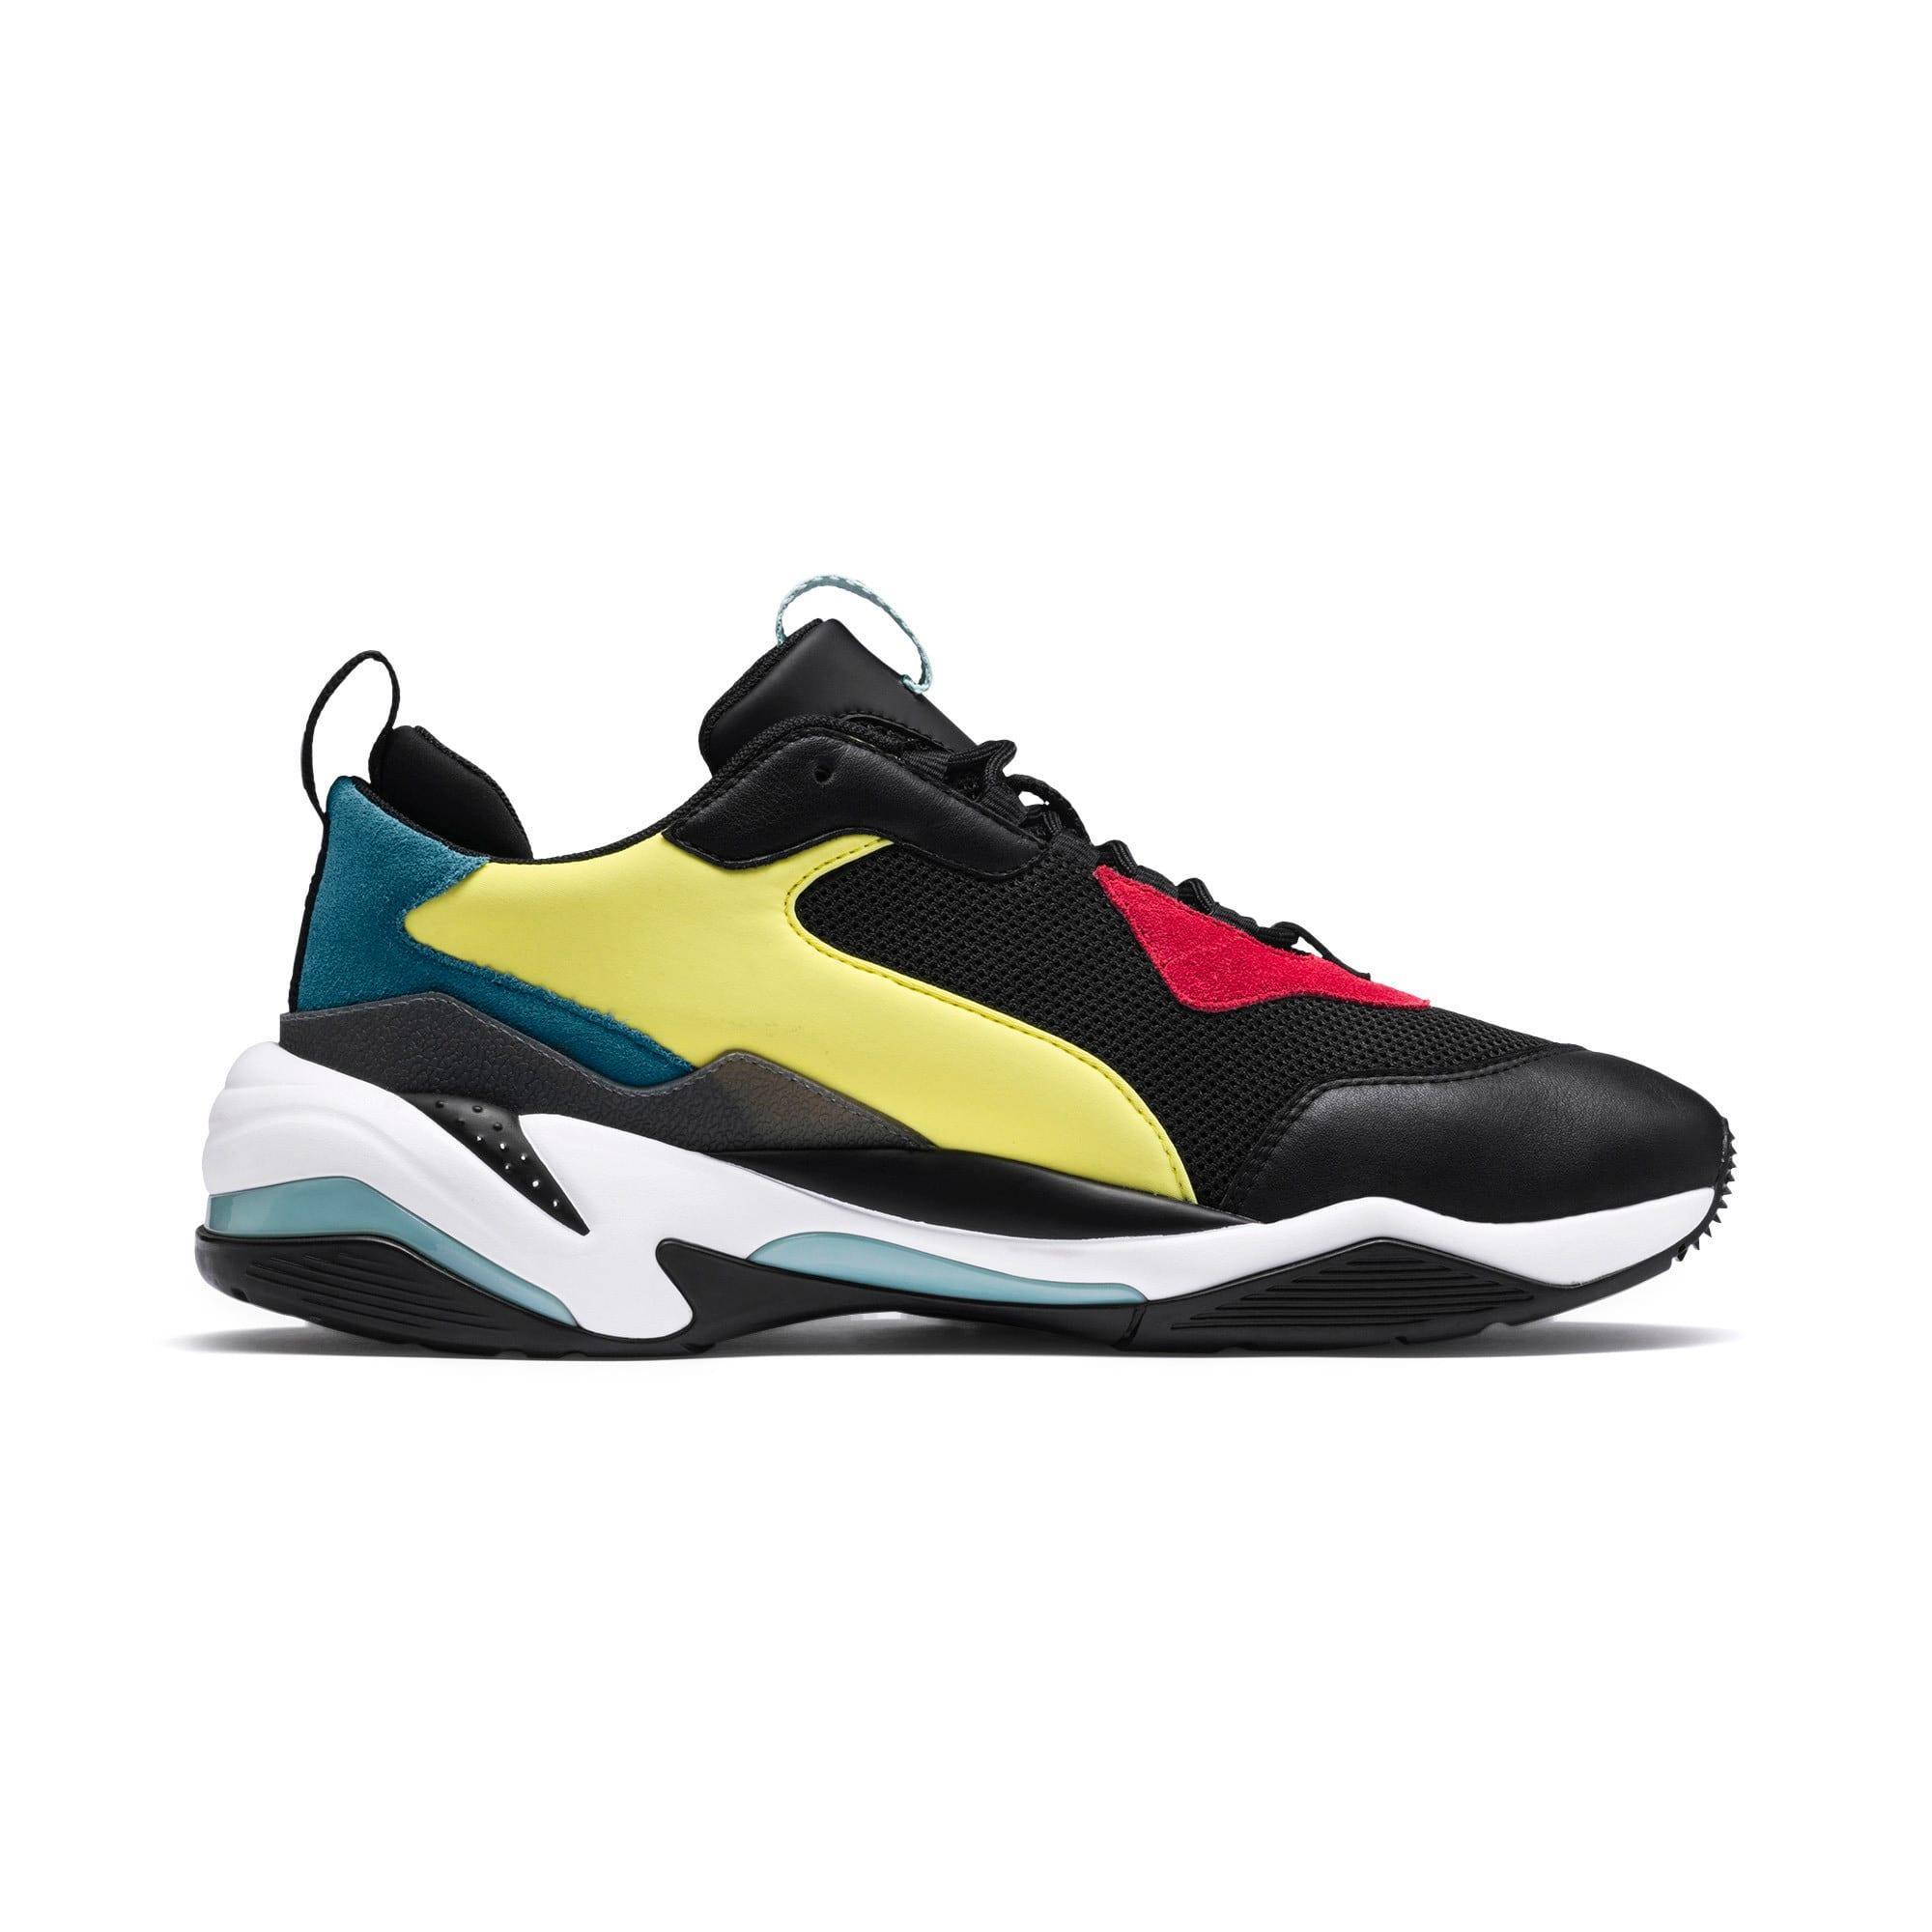 Thumbnail 5 of Sneakers Thunder Spectra, Puma Blk-Puma Blk-Puma White, medium